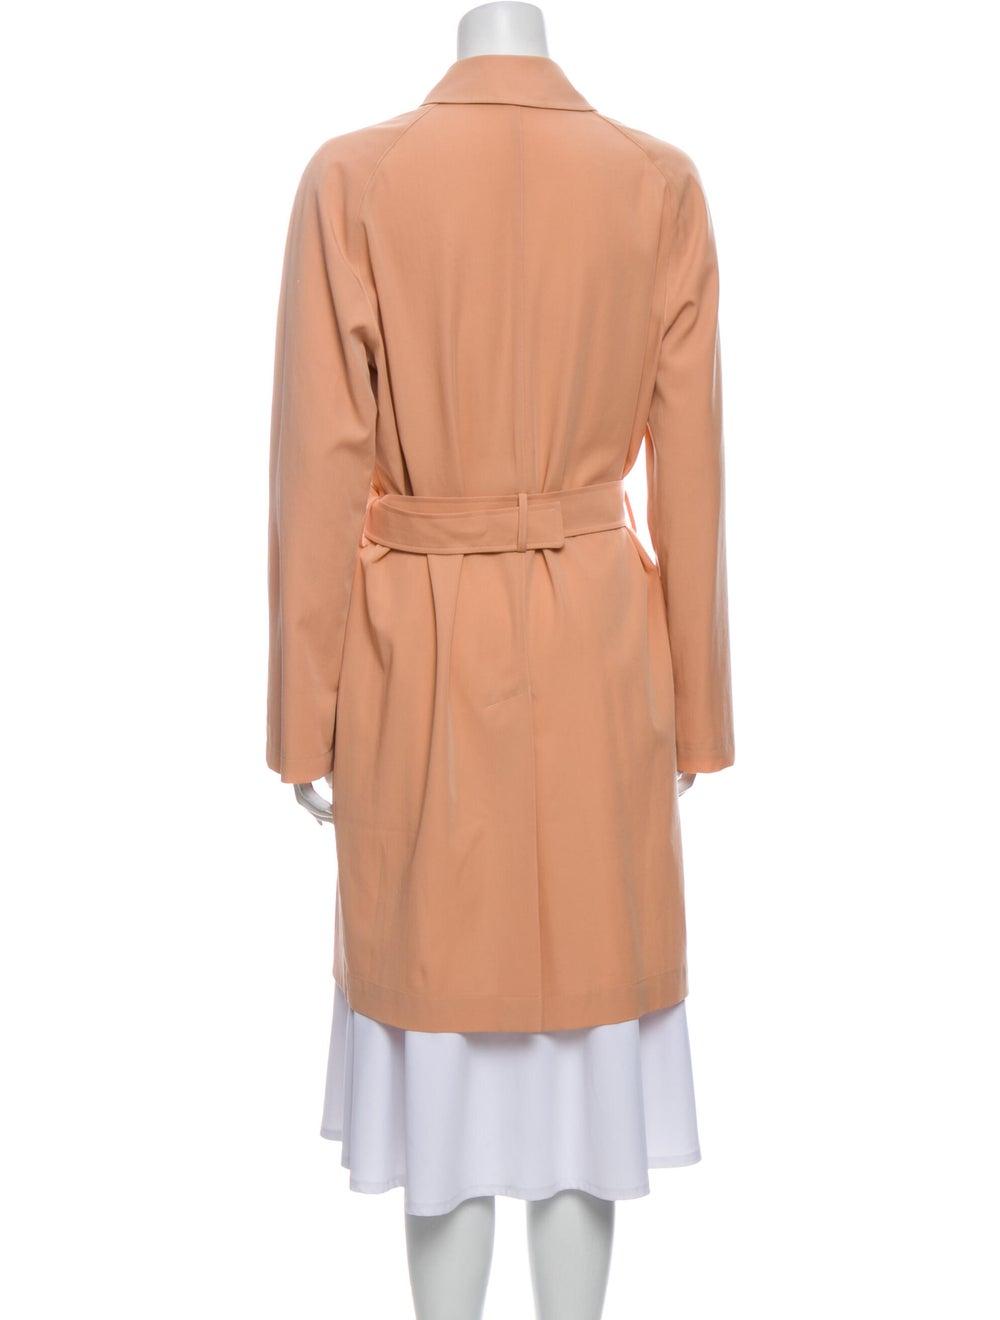 Bottega Veneta Trench Coat Pink - image 3